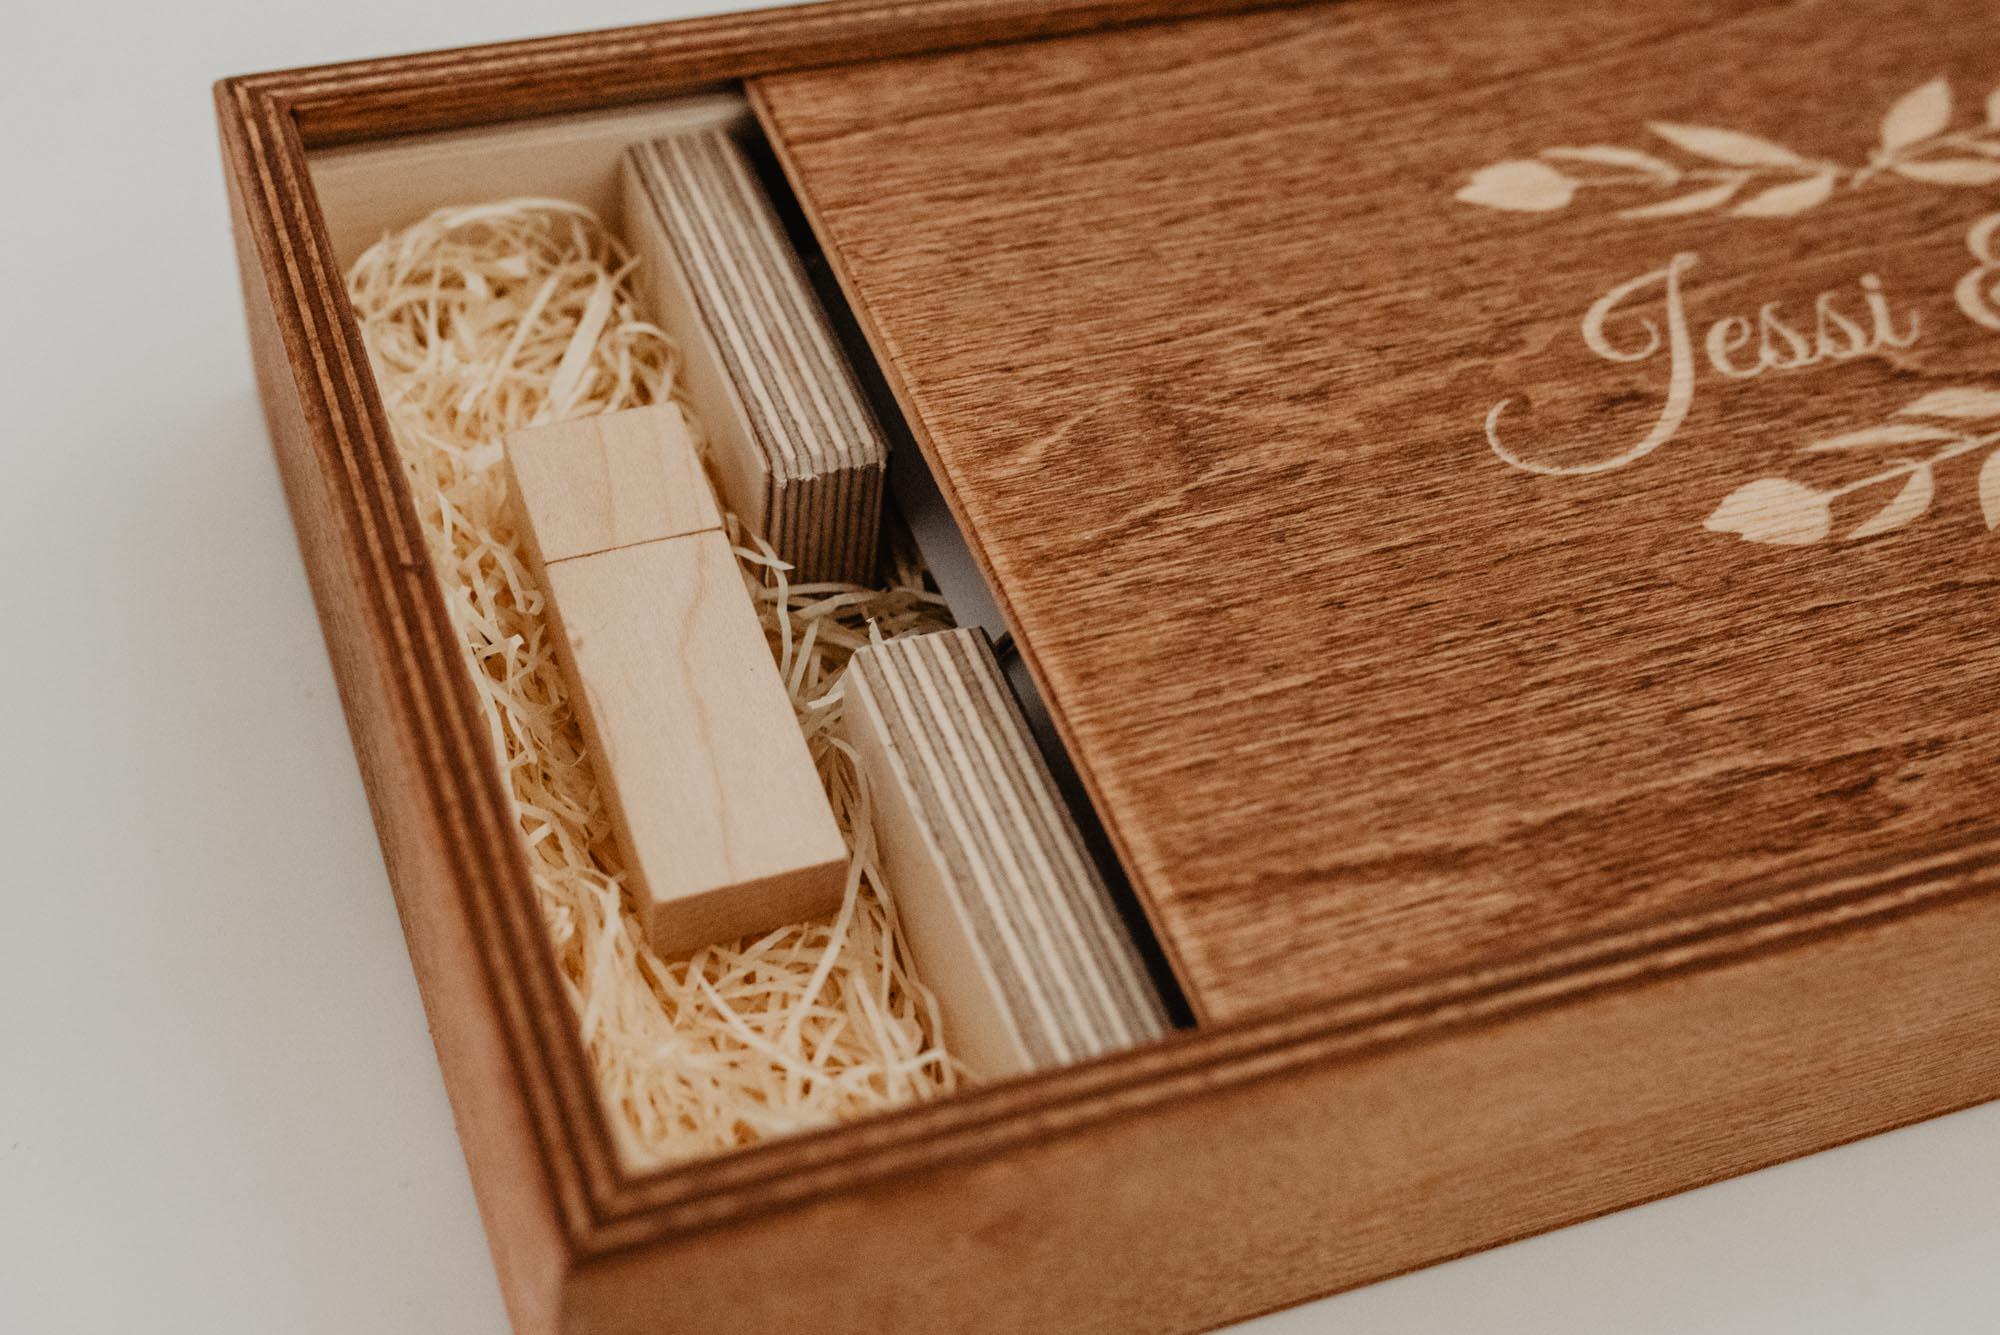 Hochzeitsfotograf Leipzig - Holzbox